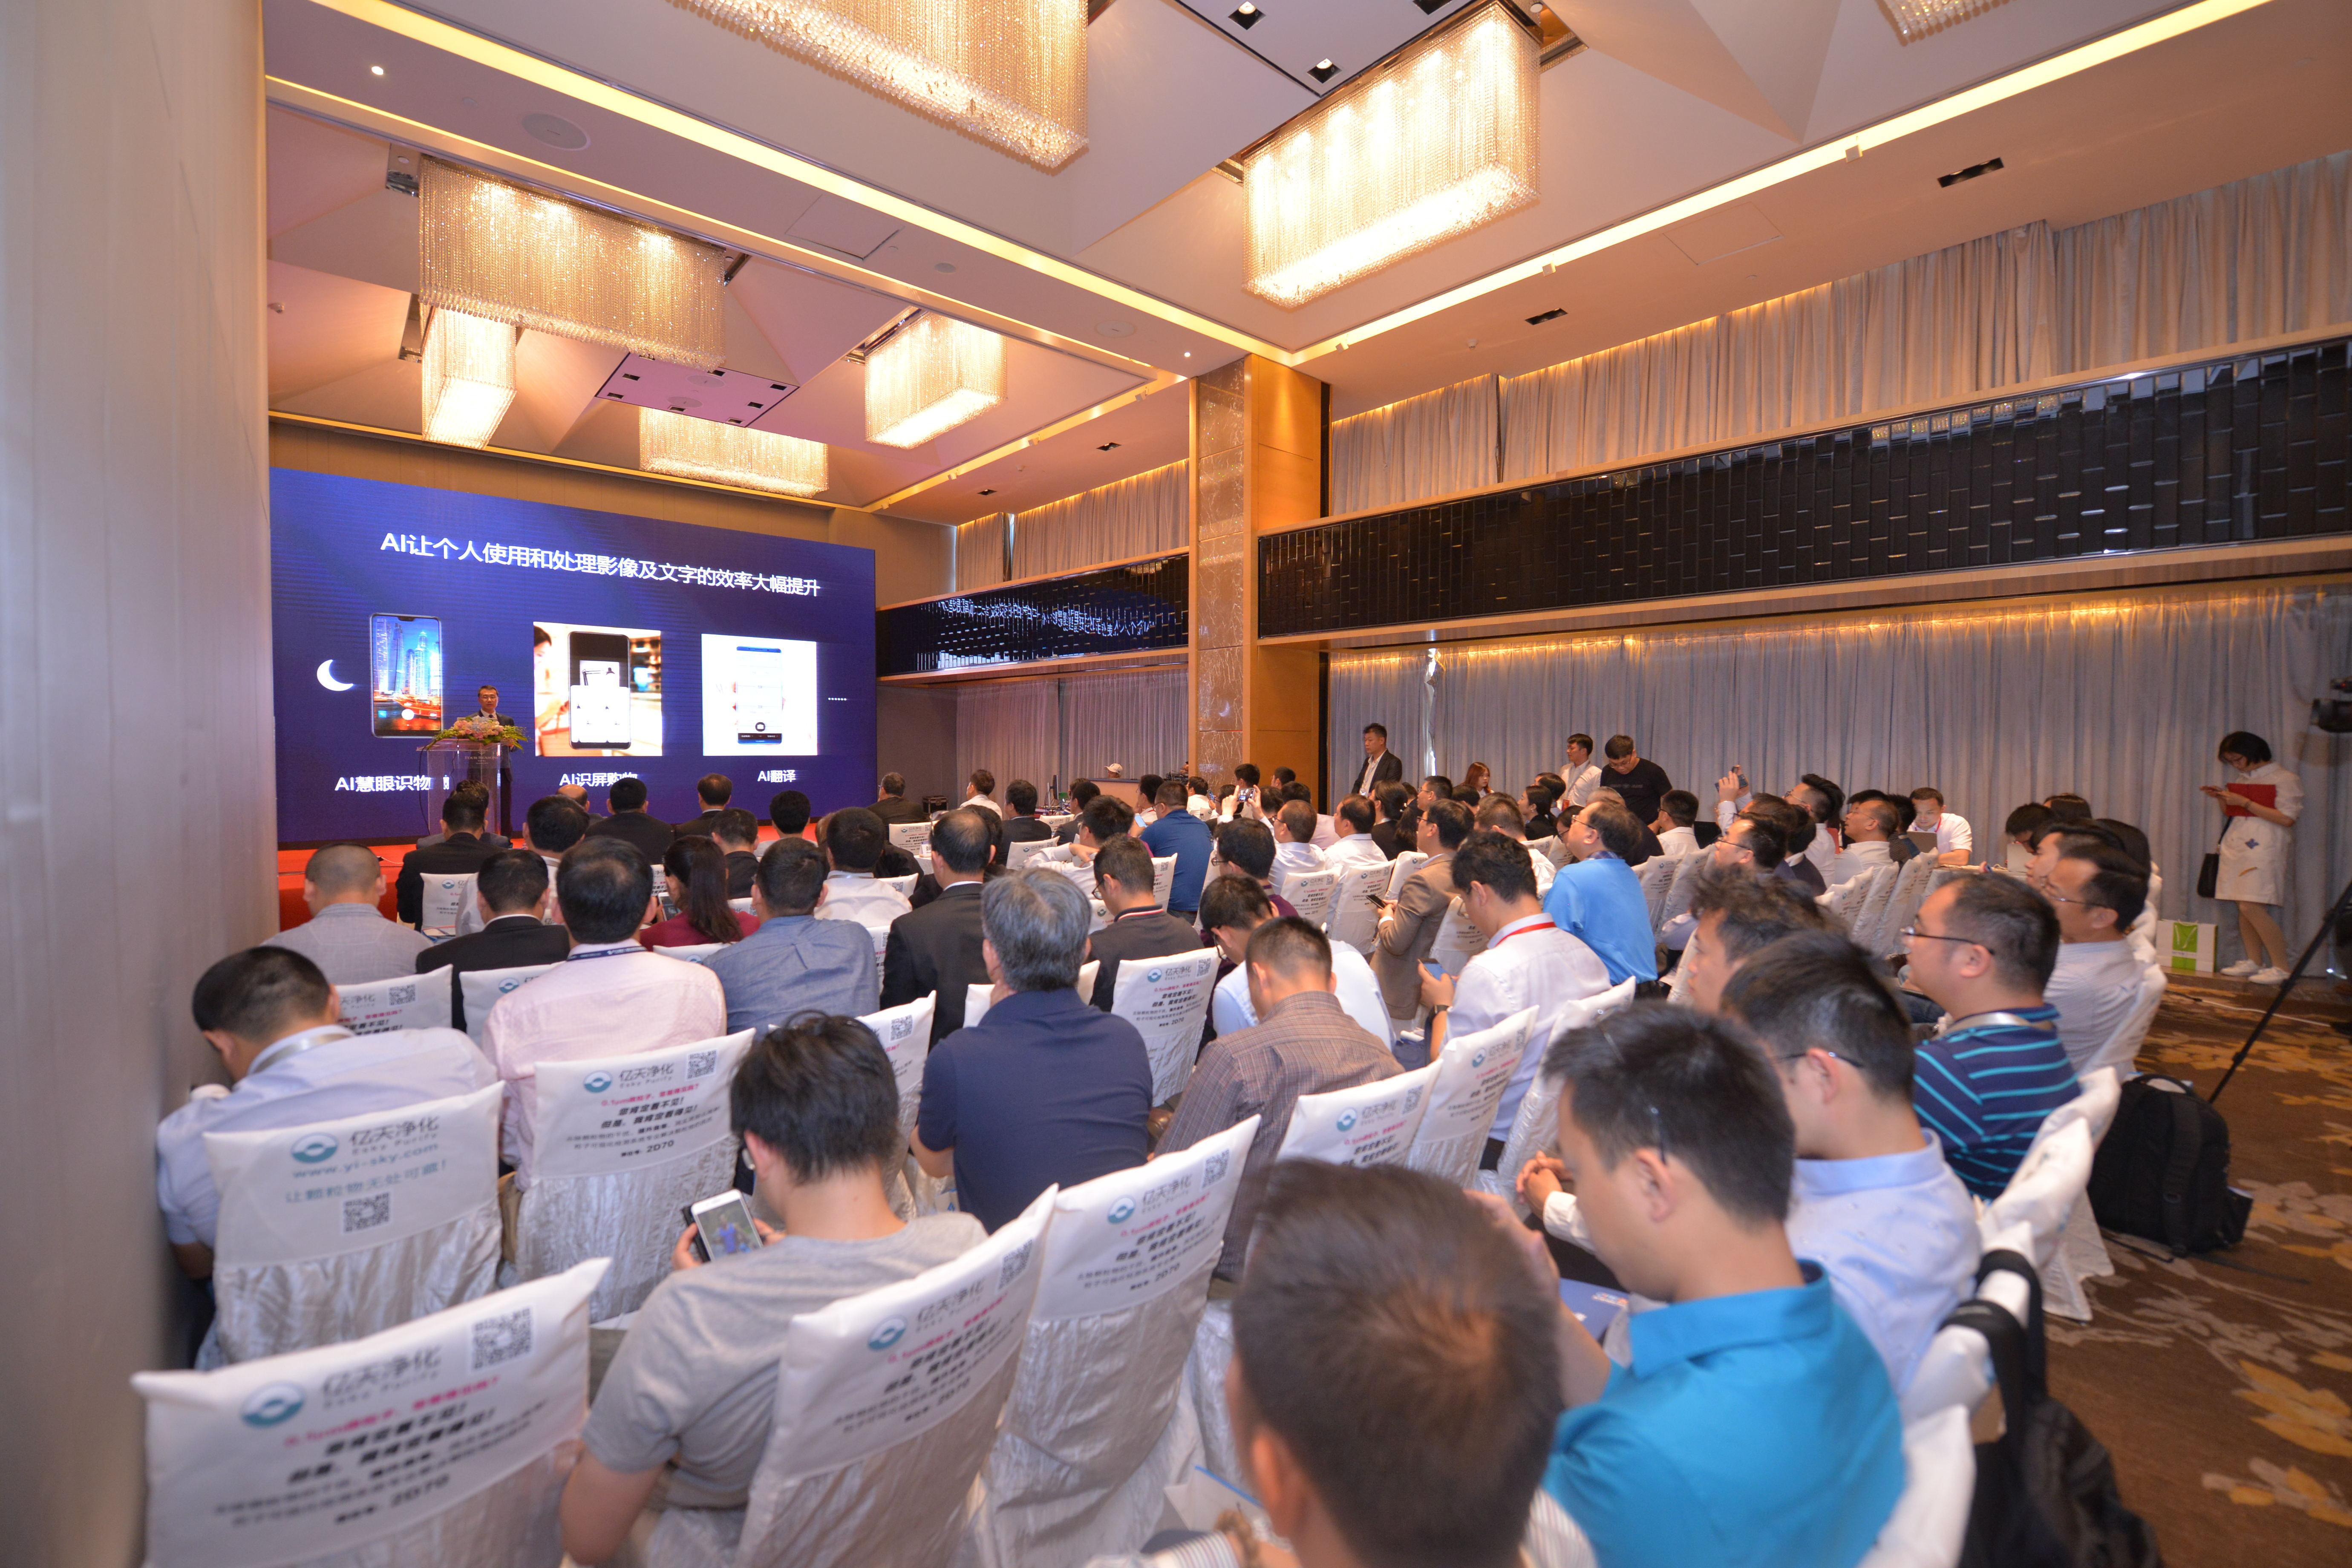 CITE2018中国智能手机行业企业家峰会